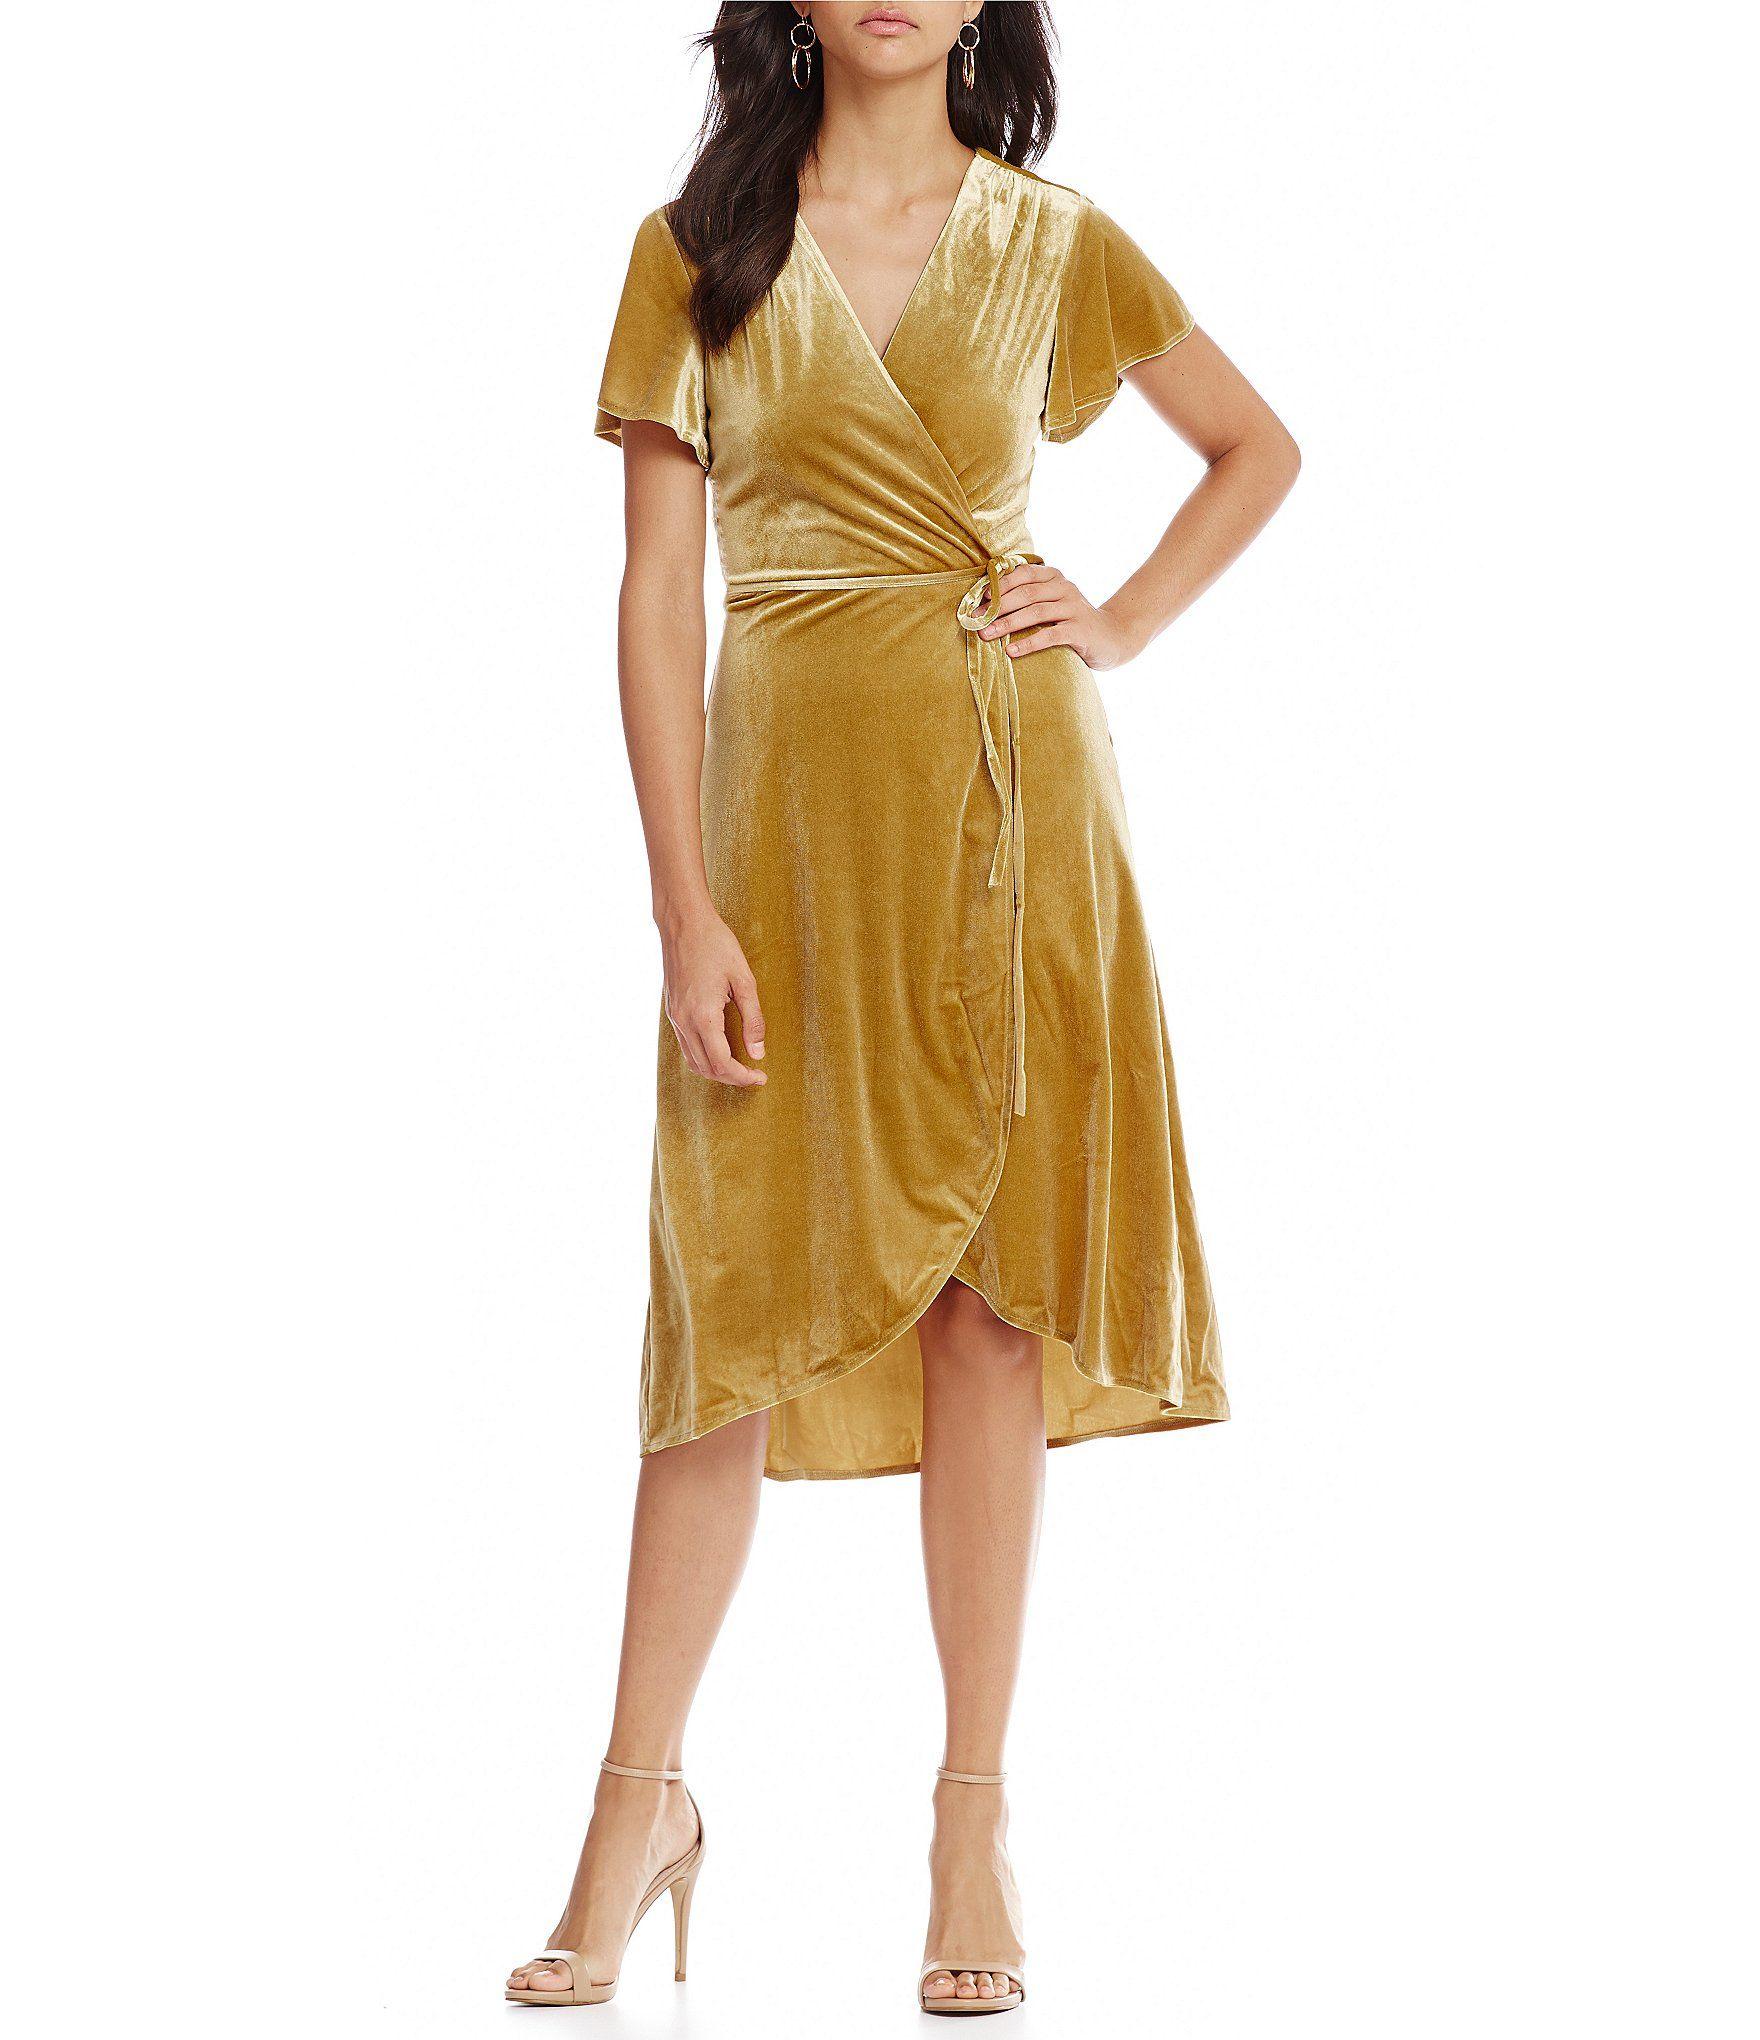 1c866cf9fd31 Shop for Lucy Paris Veronica Velvet Wrap Dress at Dillards.com. Visit  Dillards.com to find clothing